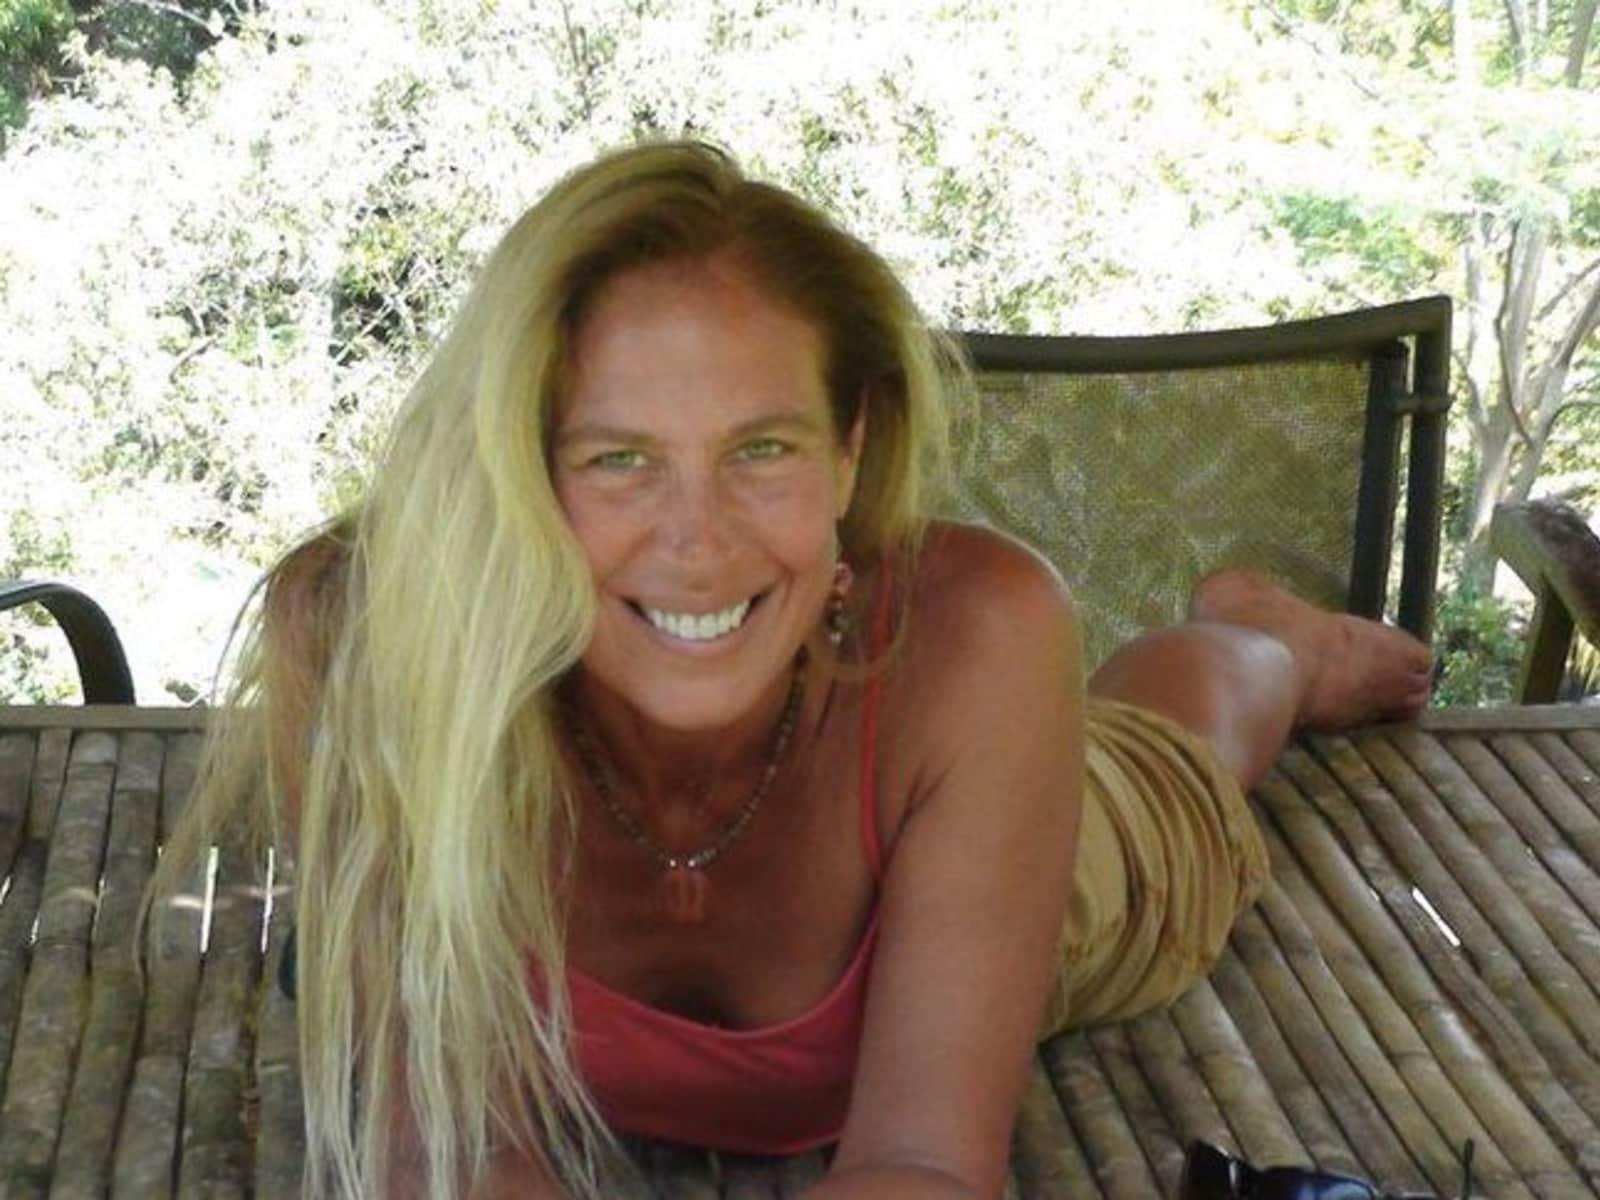 Elisa from Boulder, Colorado, United States